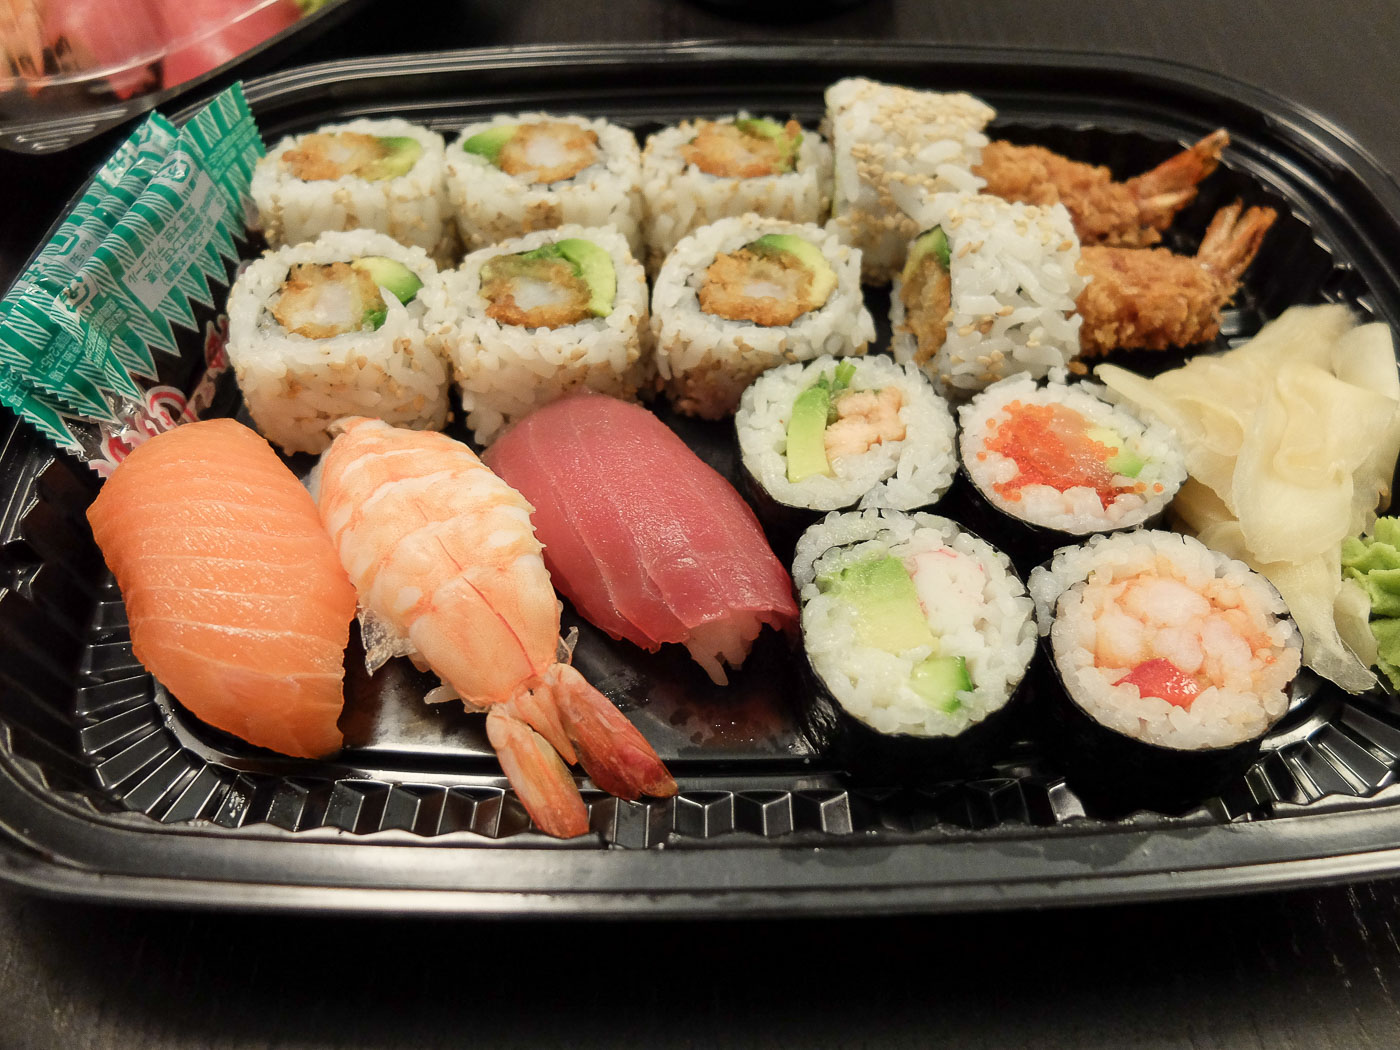 Postnummer 8240: Tør sushi uden smag, men vinen var god